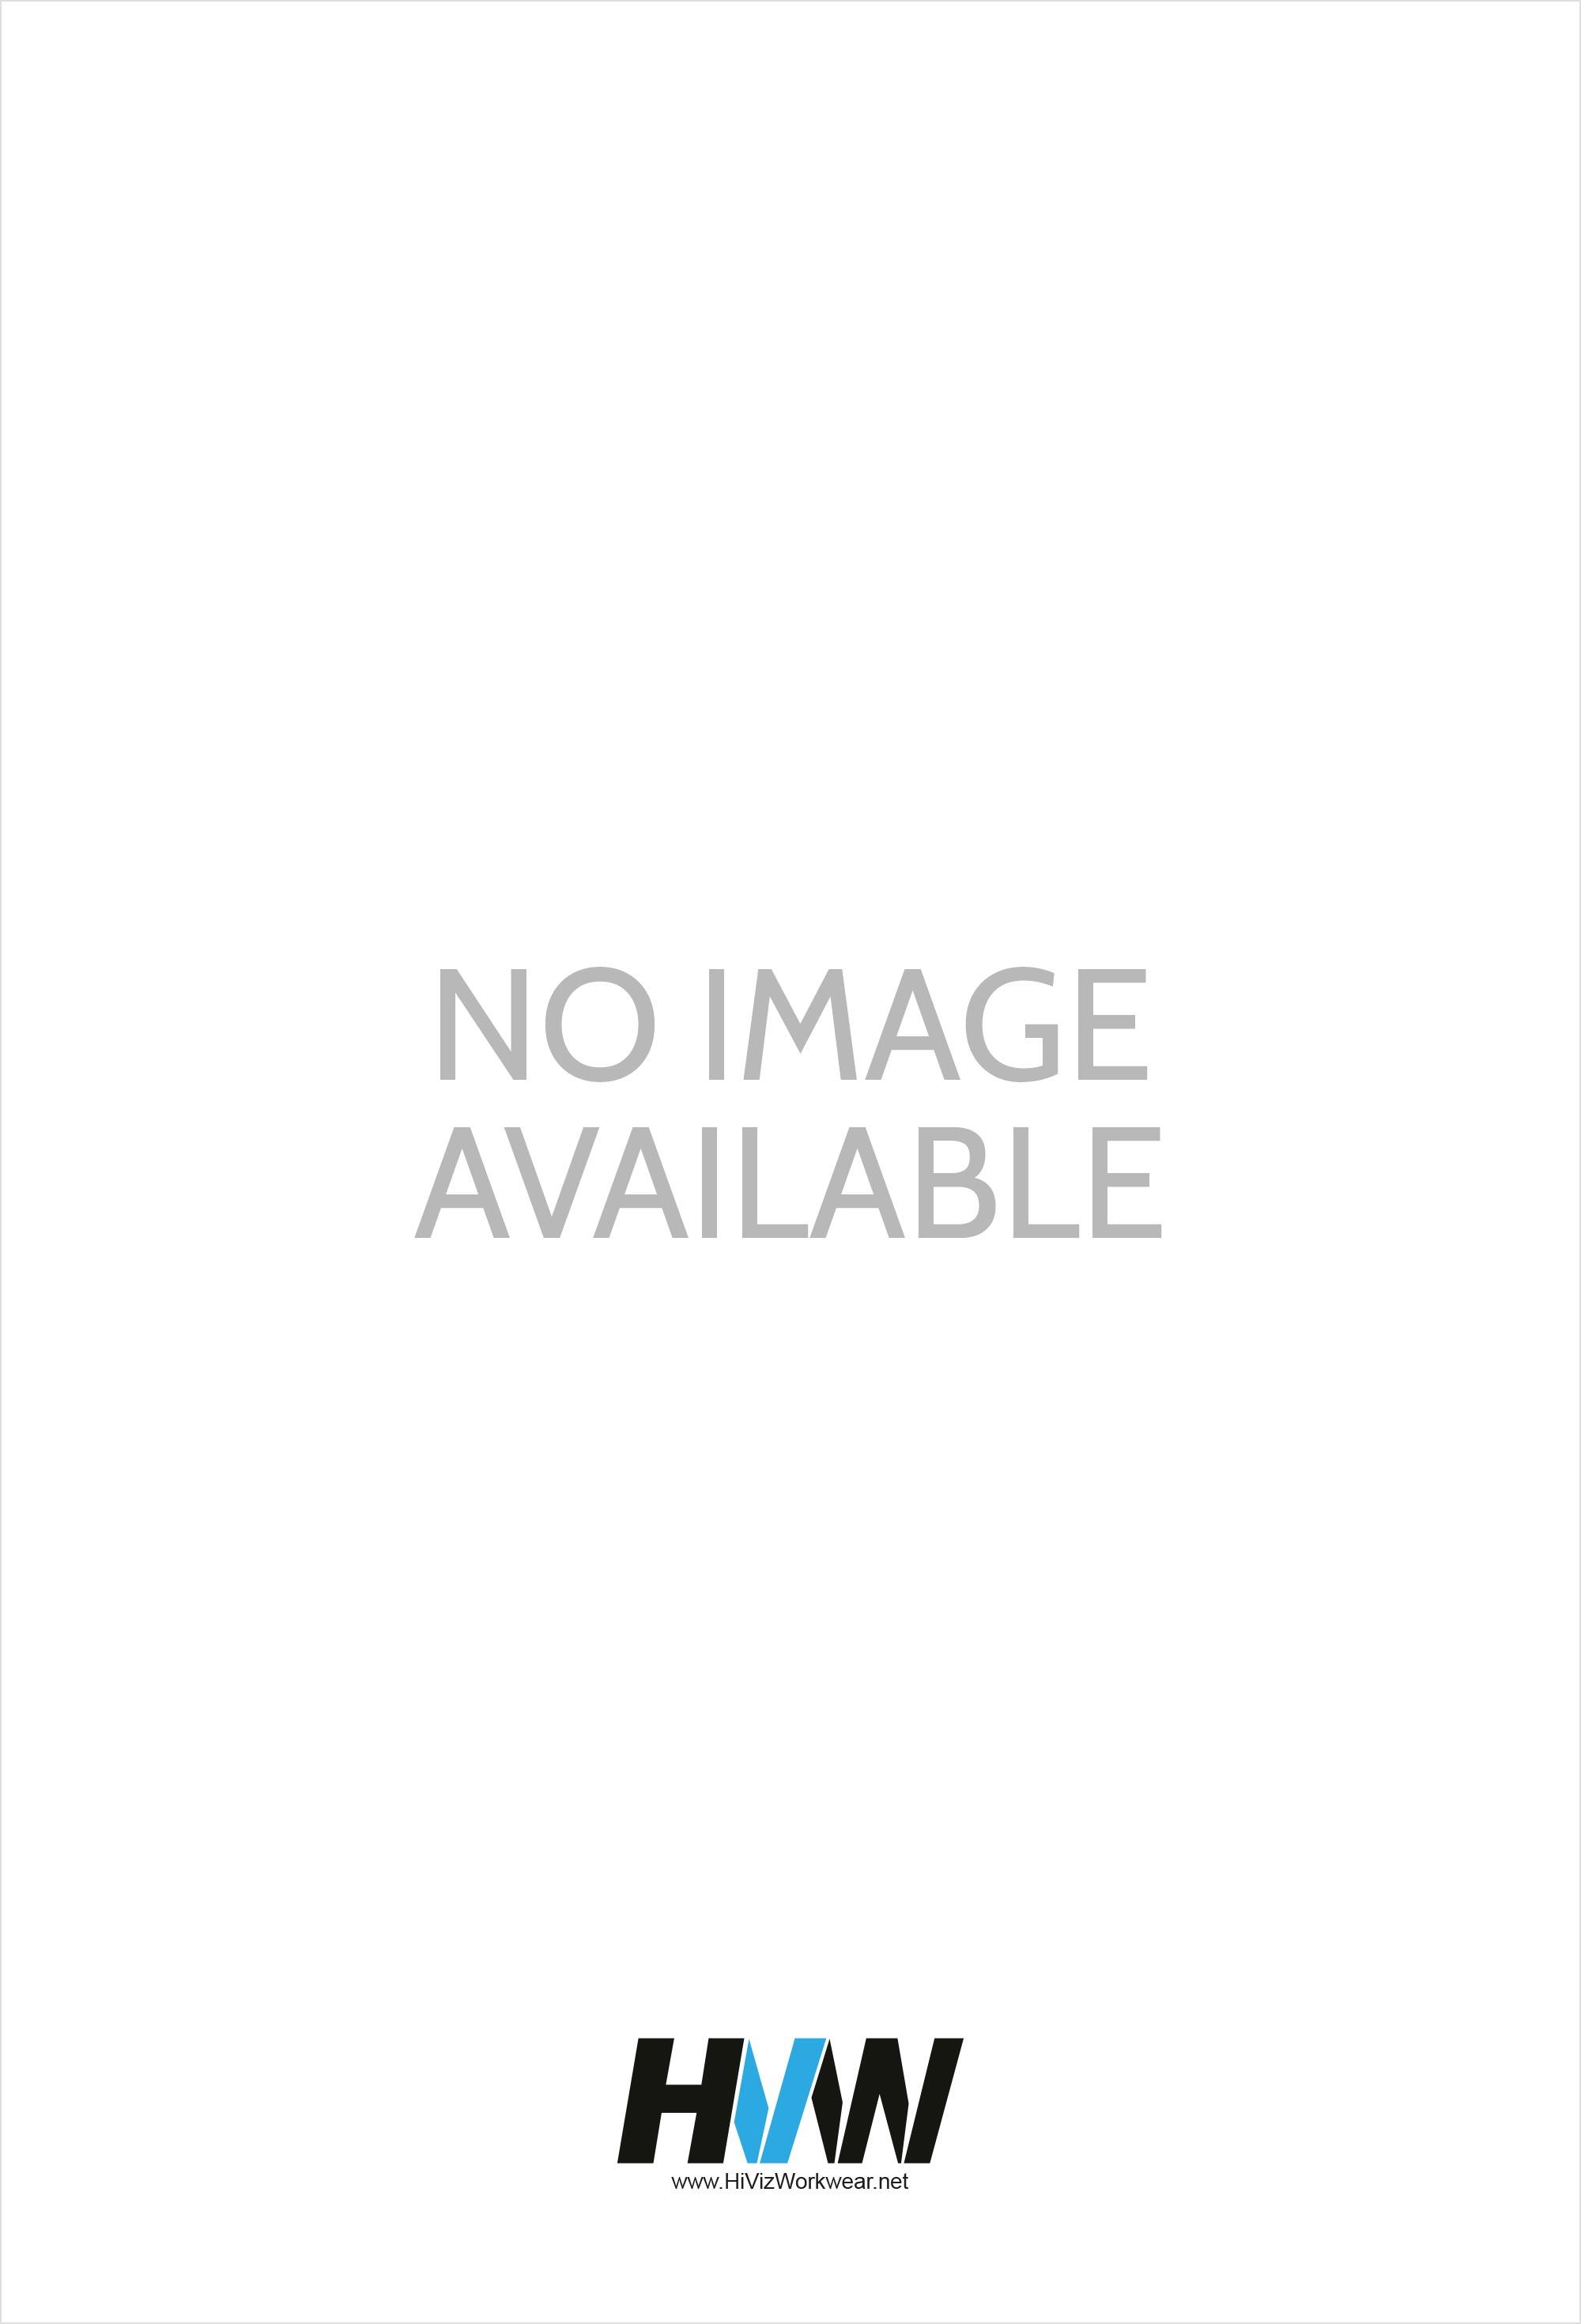 Clpks beeswift pk polo shirt for Mens work polo shirts